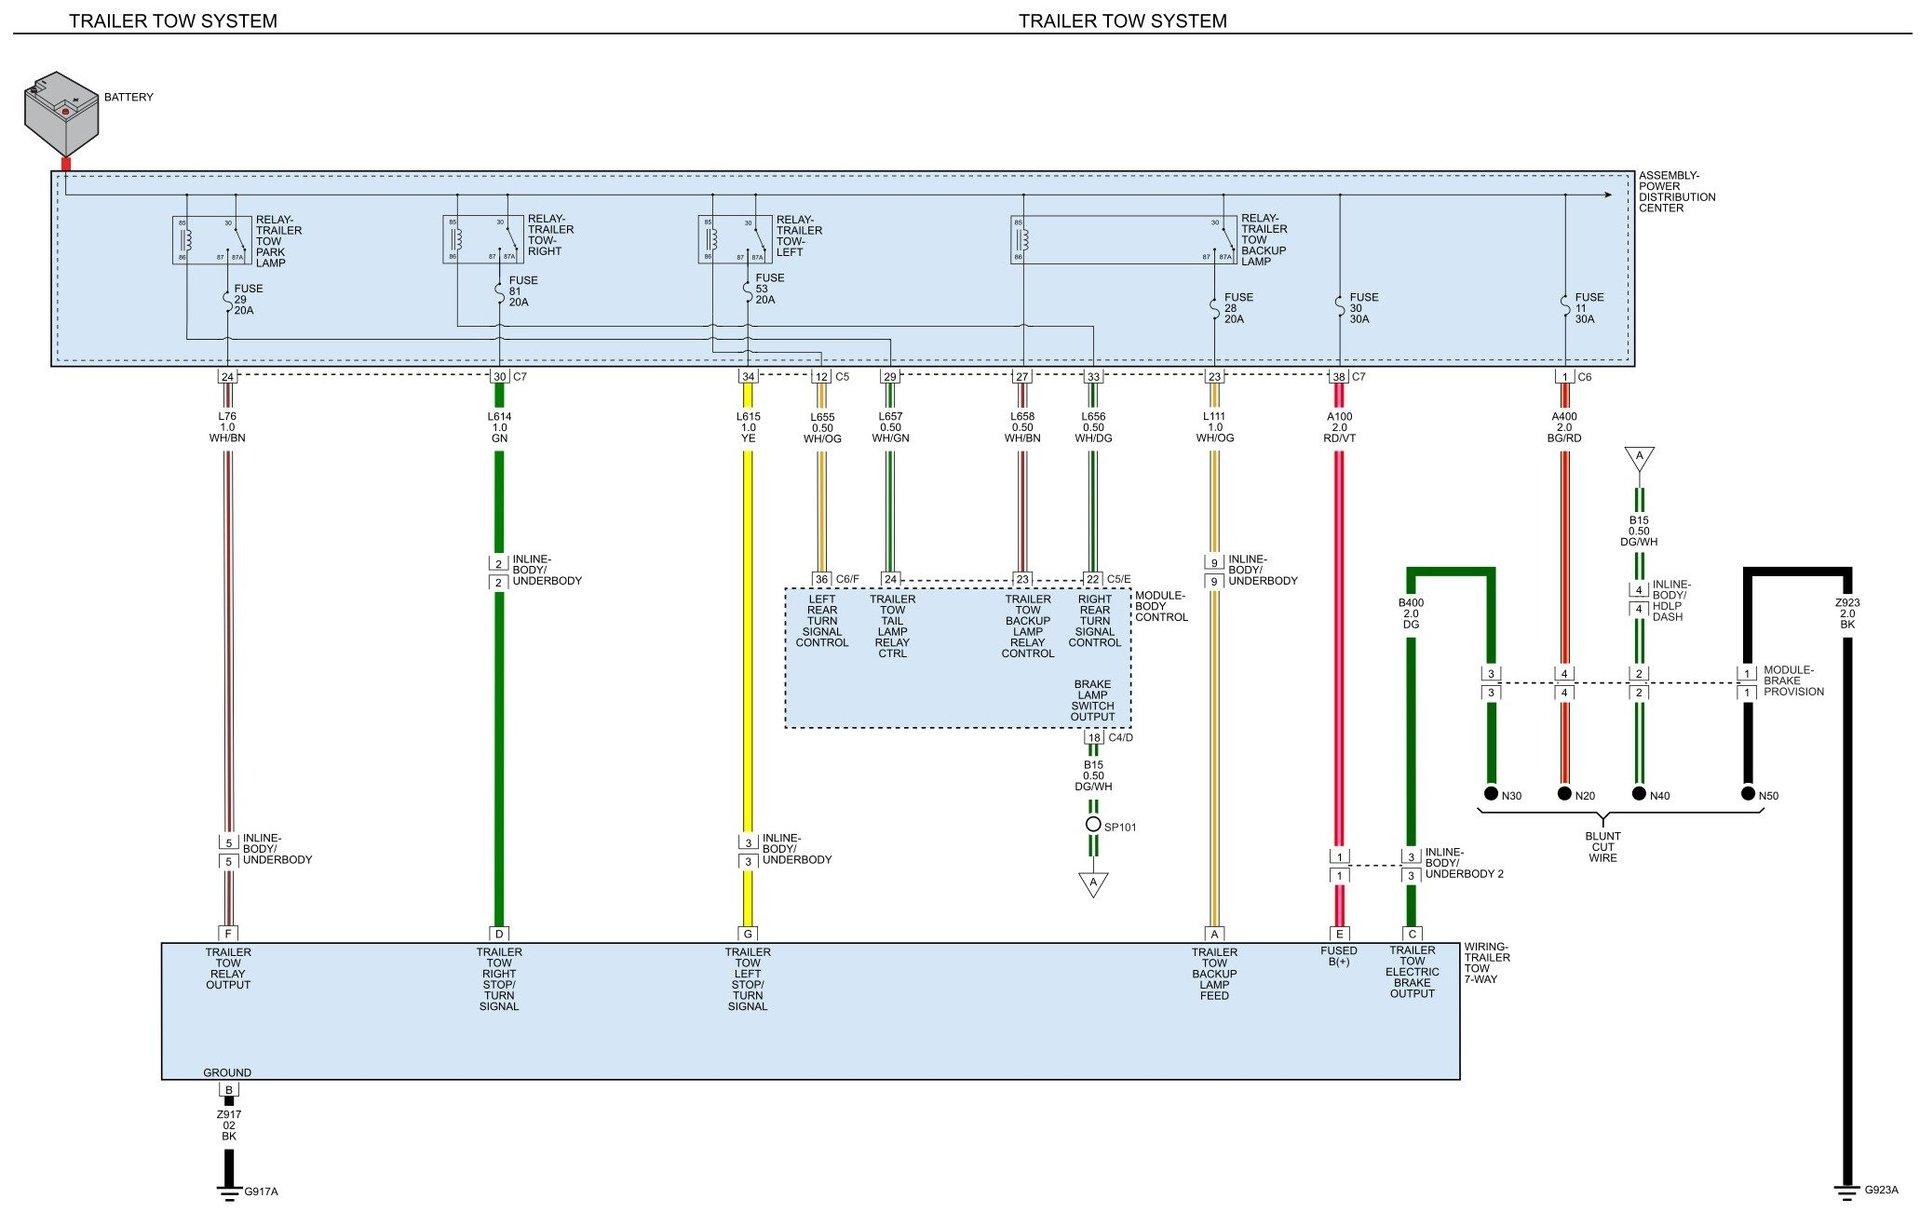 dodge durango trailer wiring diagram guide for installing tow wiring harness dodge durango forum  guide for installing tow wiring harness